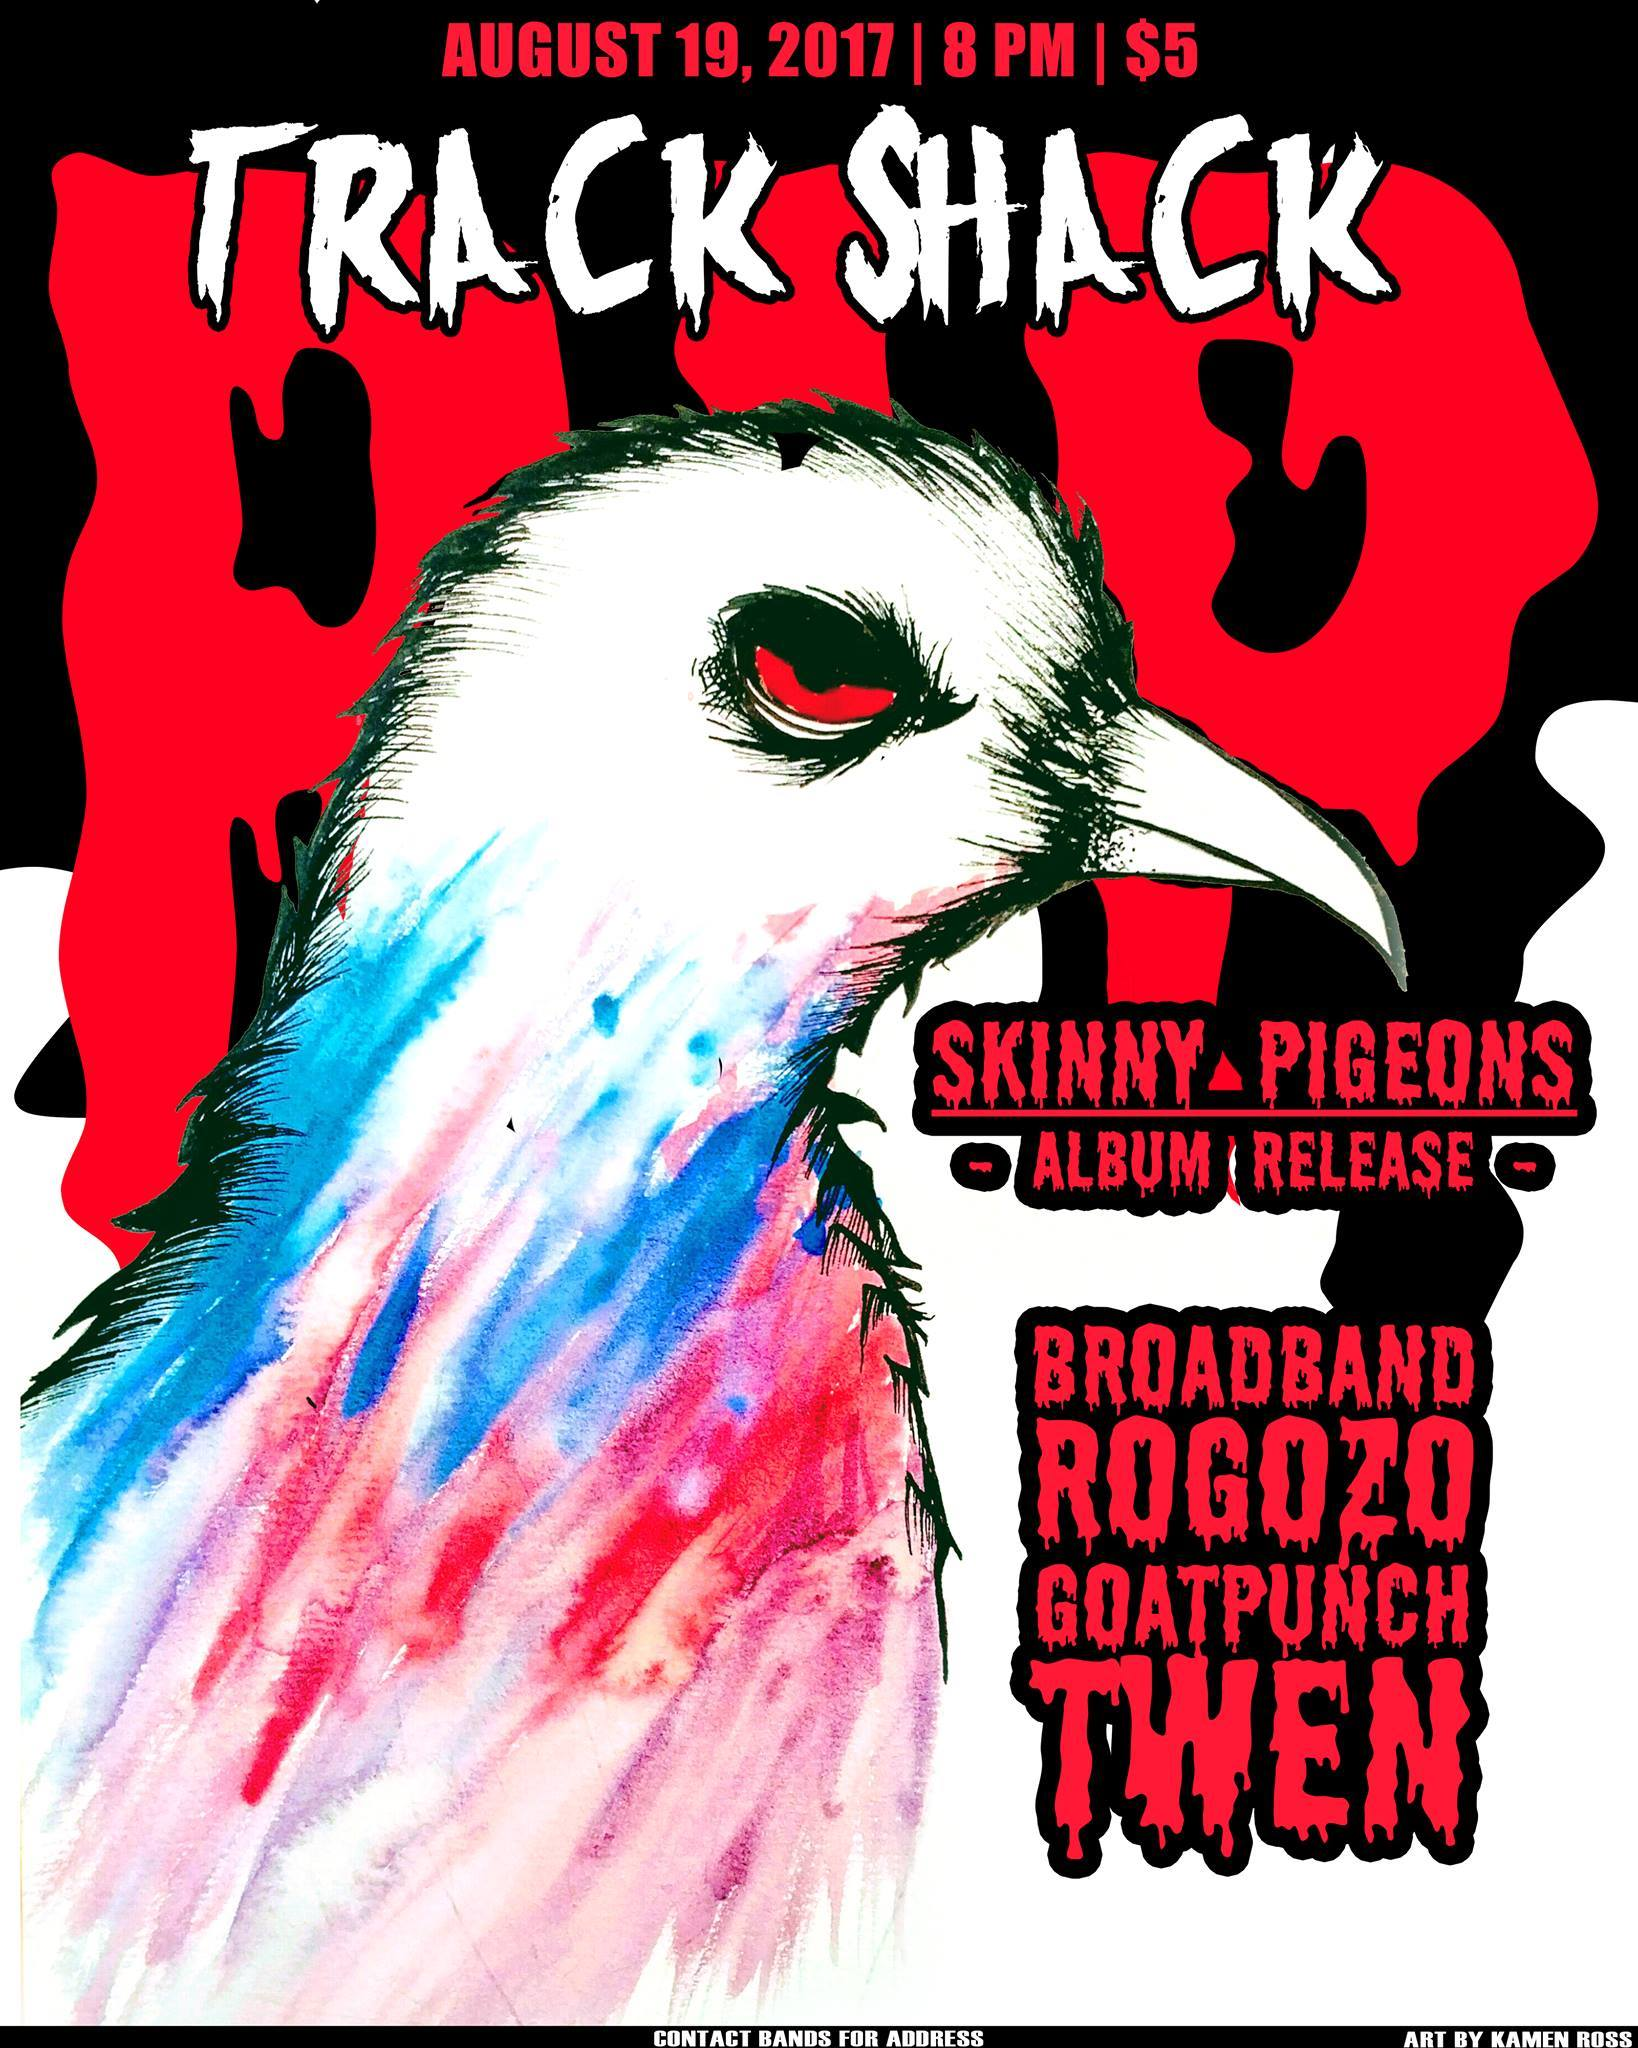 Album Porno skinny pigeons (album release) with twen, goatpunch, porno portal to  florida, broadband - final track shack show   boston hassle